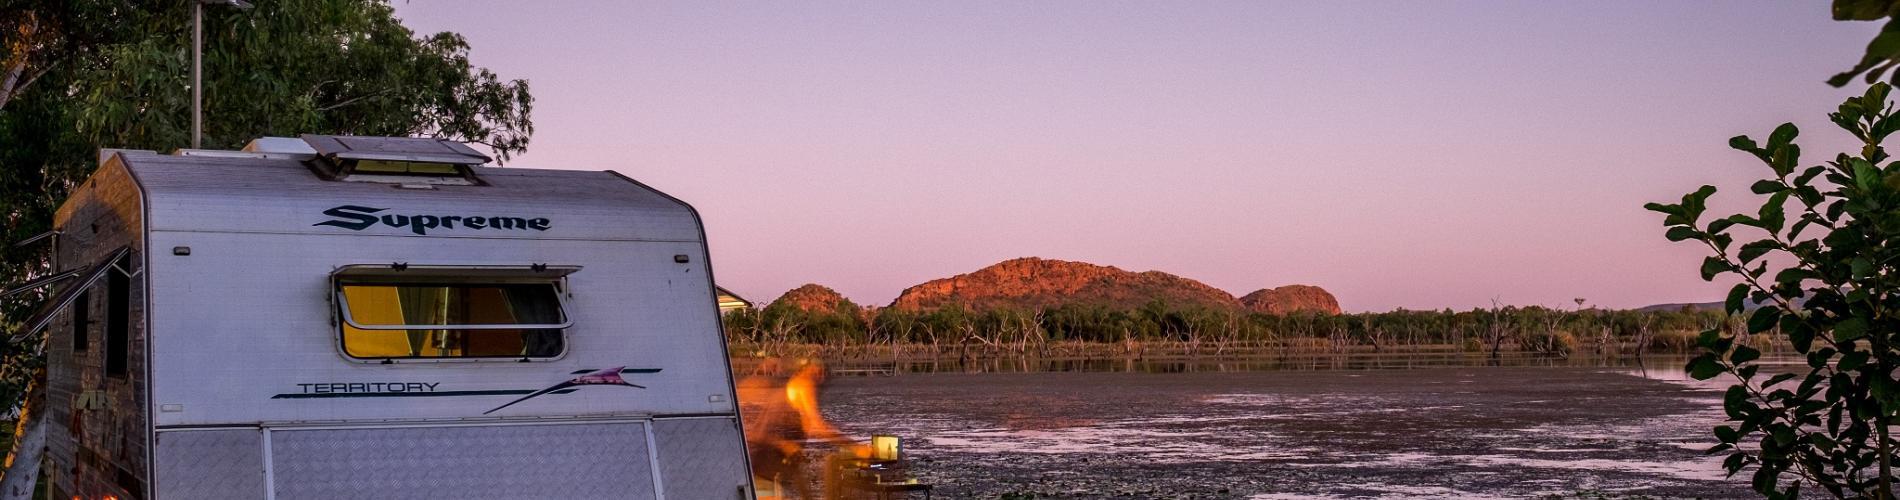 Waterfront Sites Kimberleyland in Kununurra